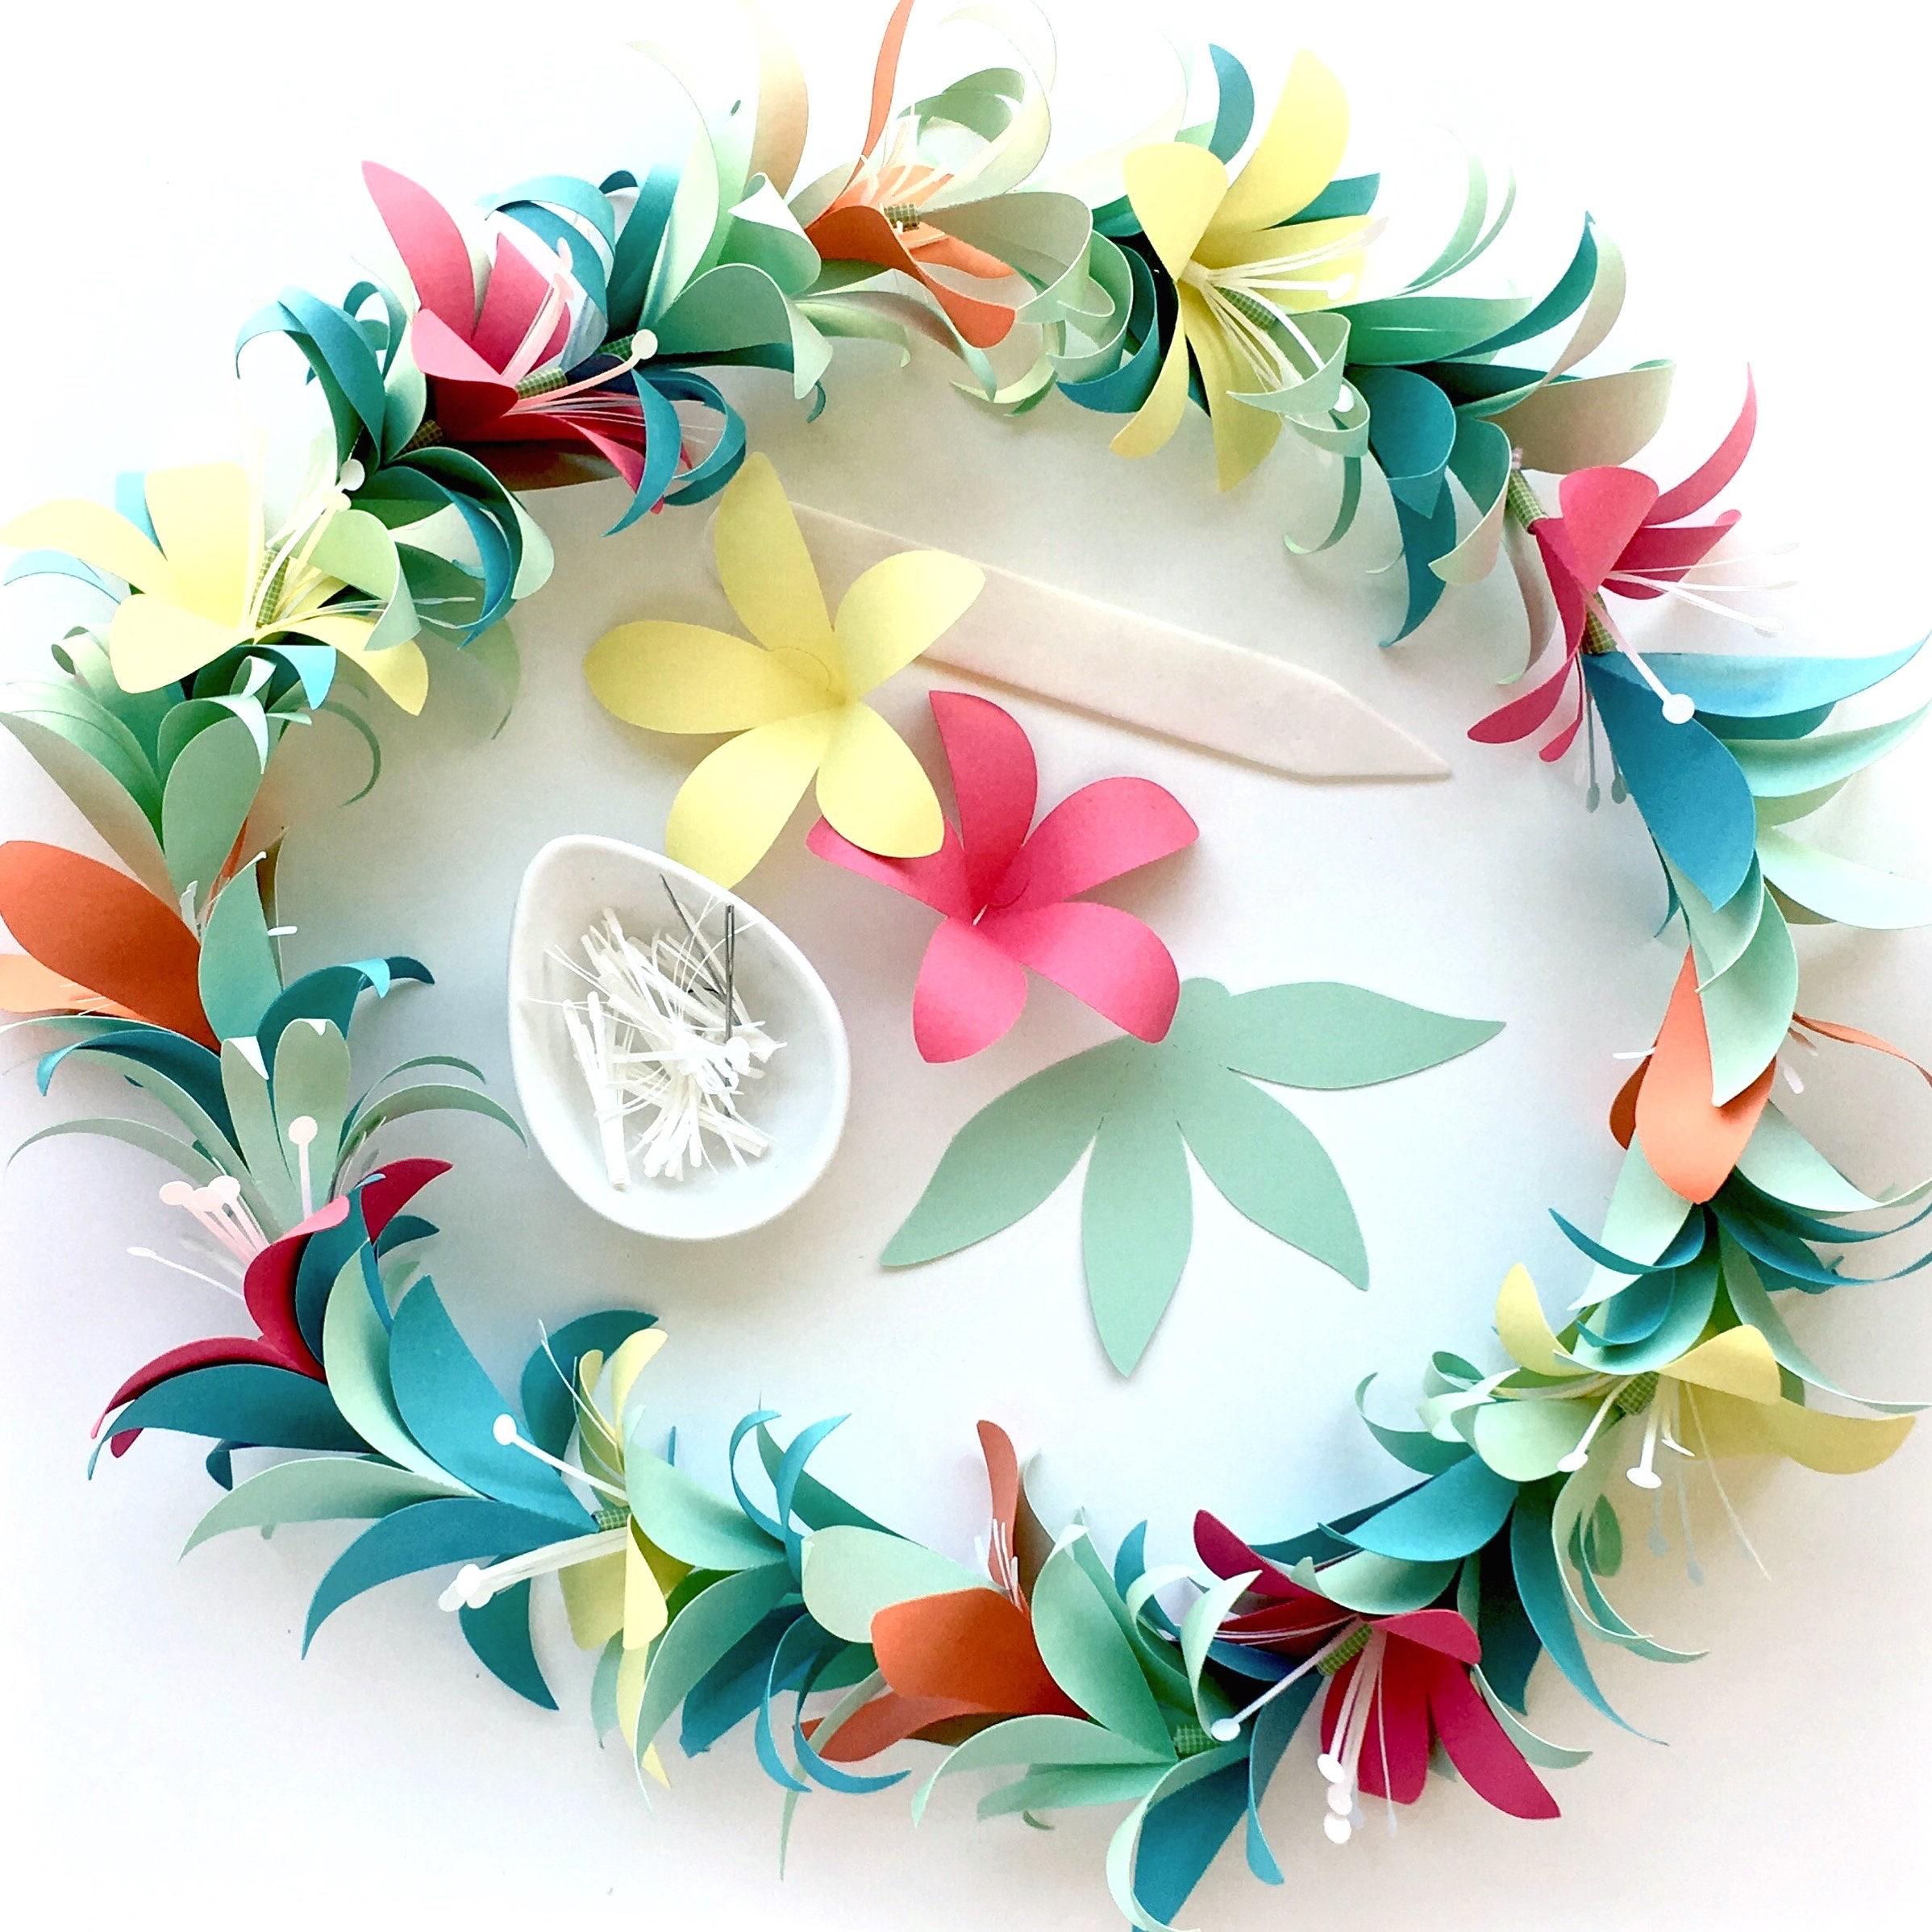 Diy Flower Garland: Flower Garland DIY Templates For Silhouette Cricut Explore Or